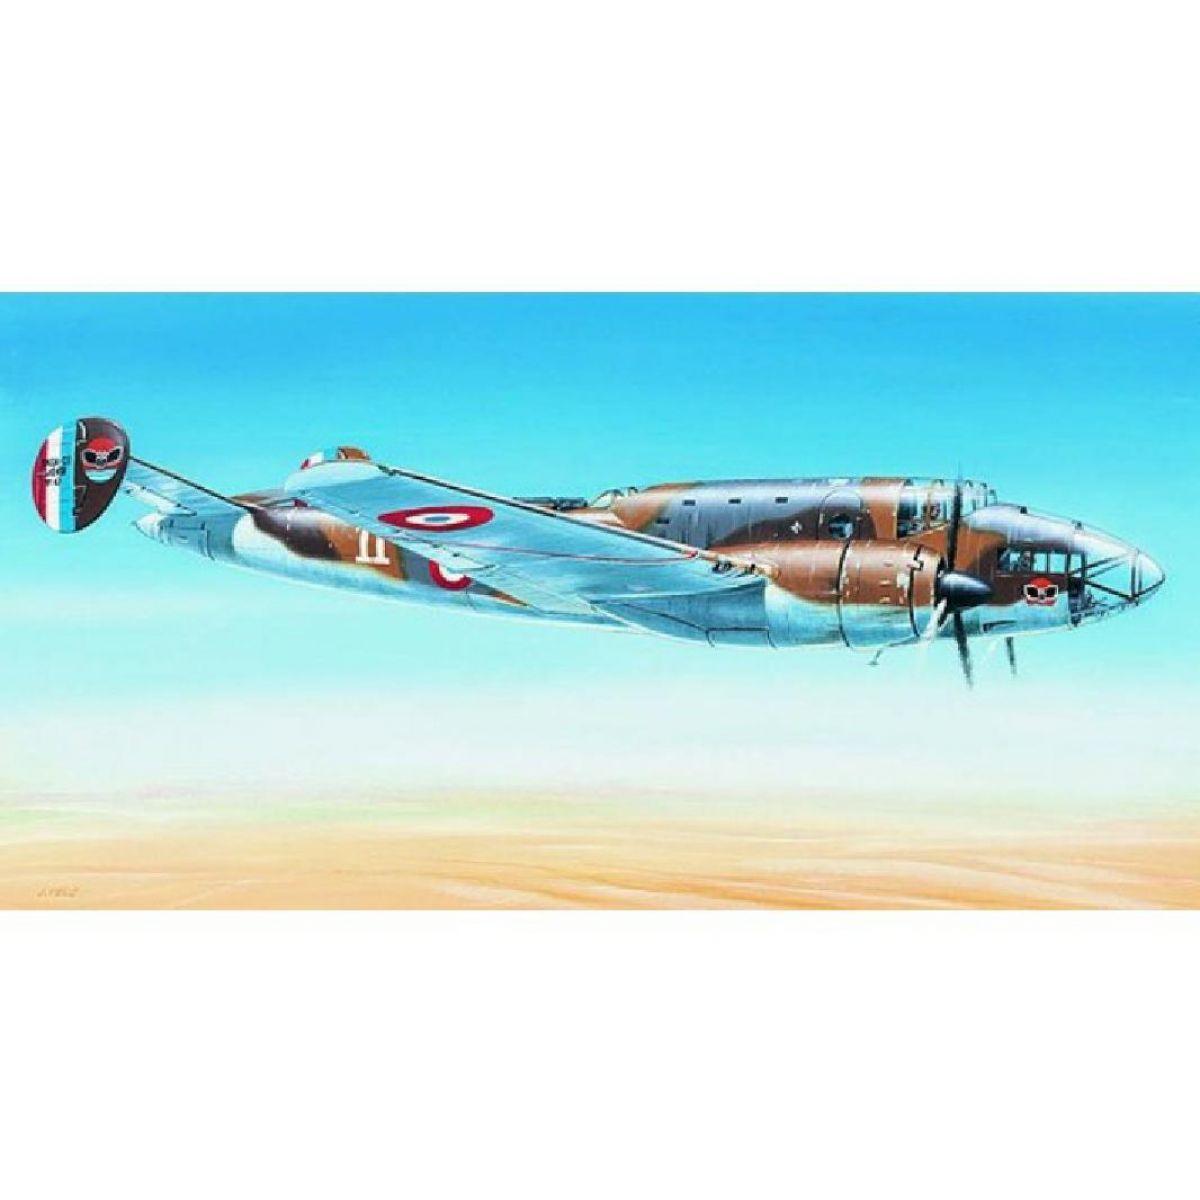 Směr Leo 451 Modely letadel